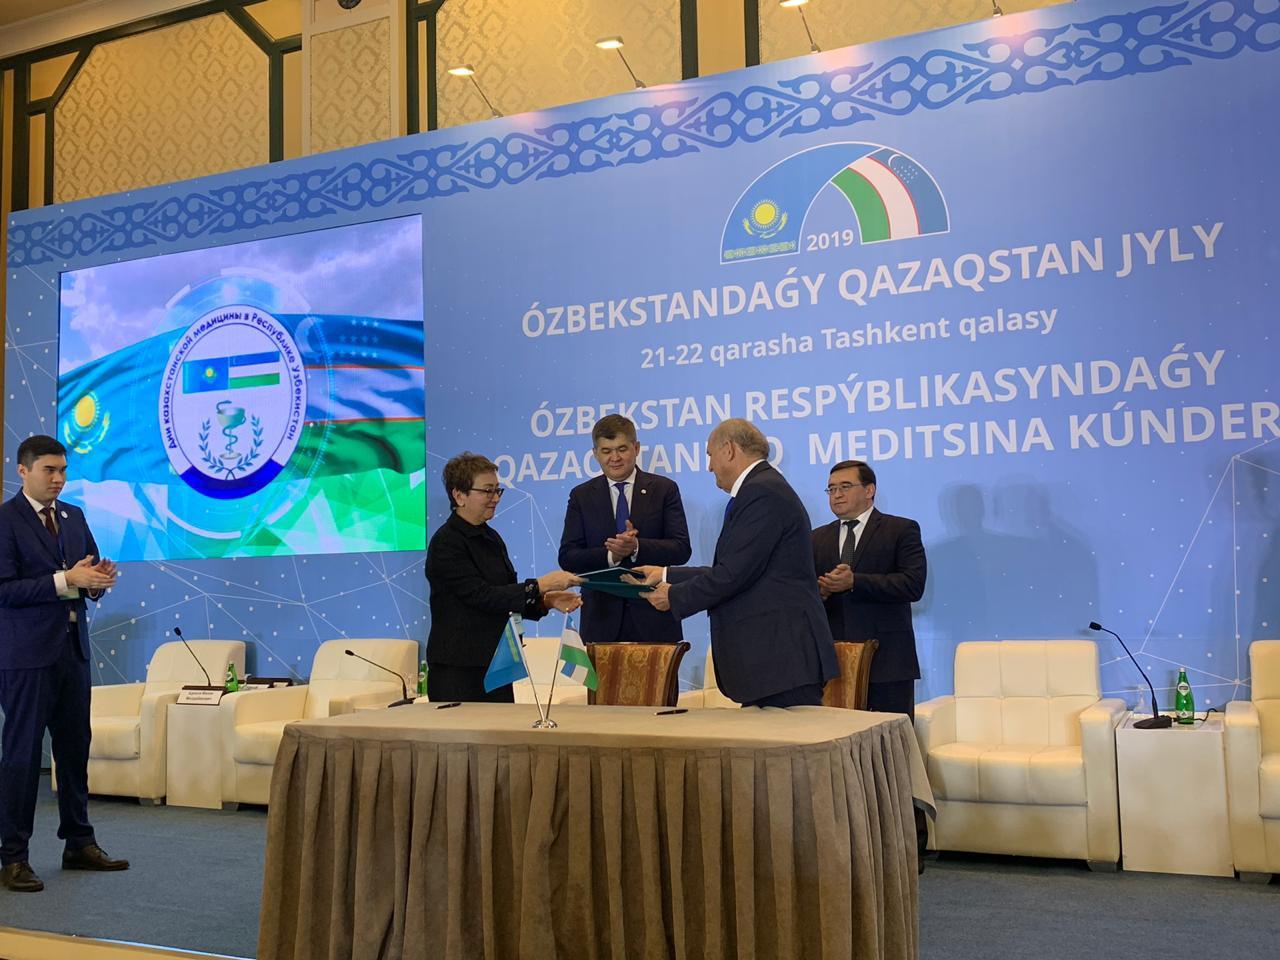 Меморандум о сотрудничестве заключили центры кардиологии Казахстана и Узбекистана